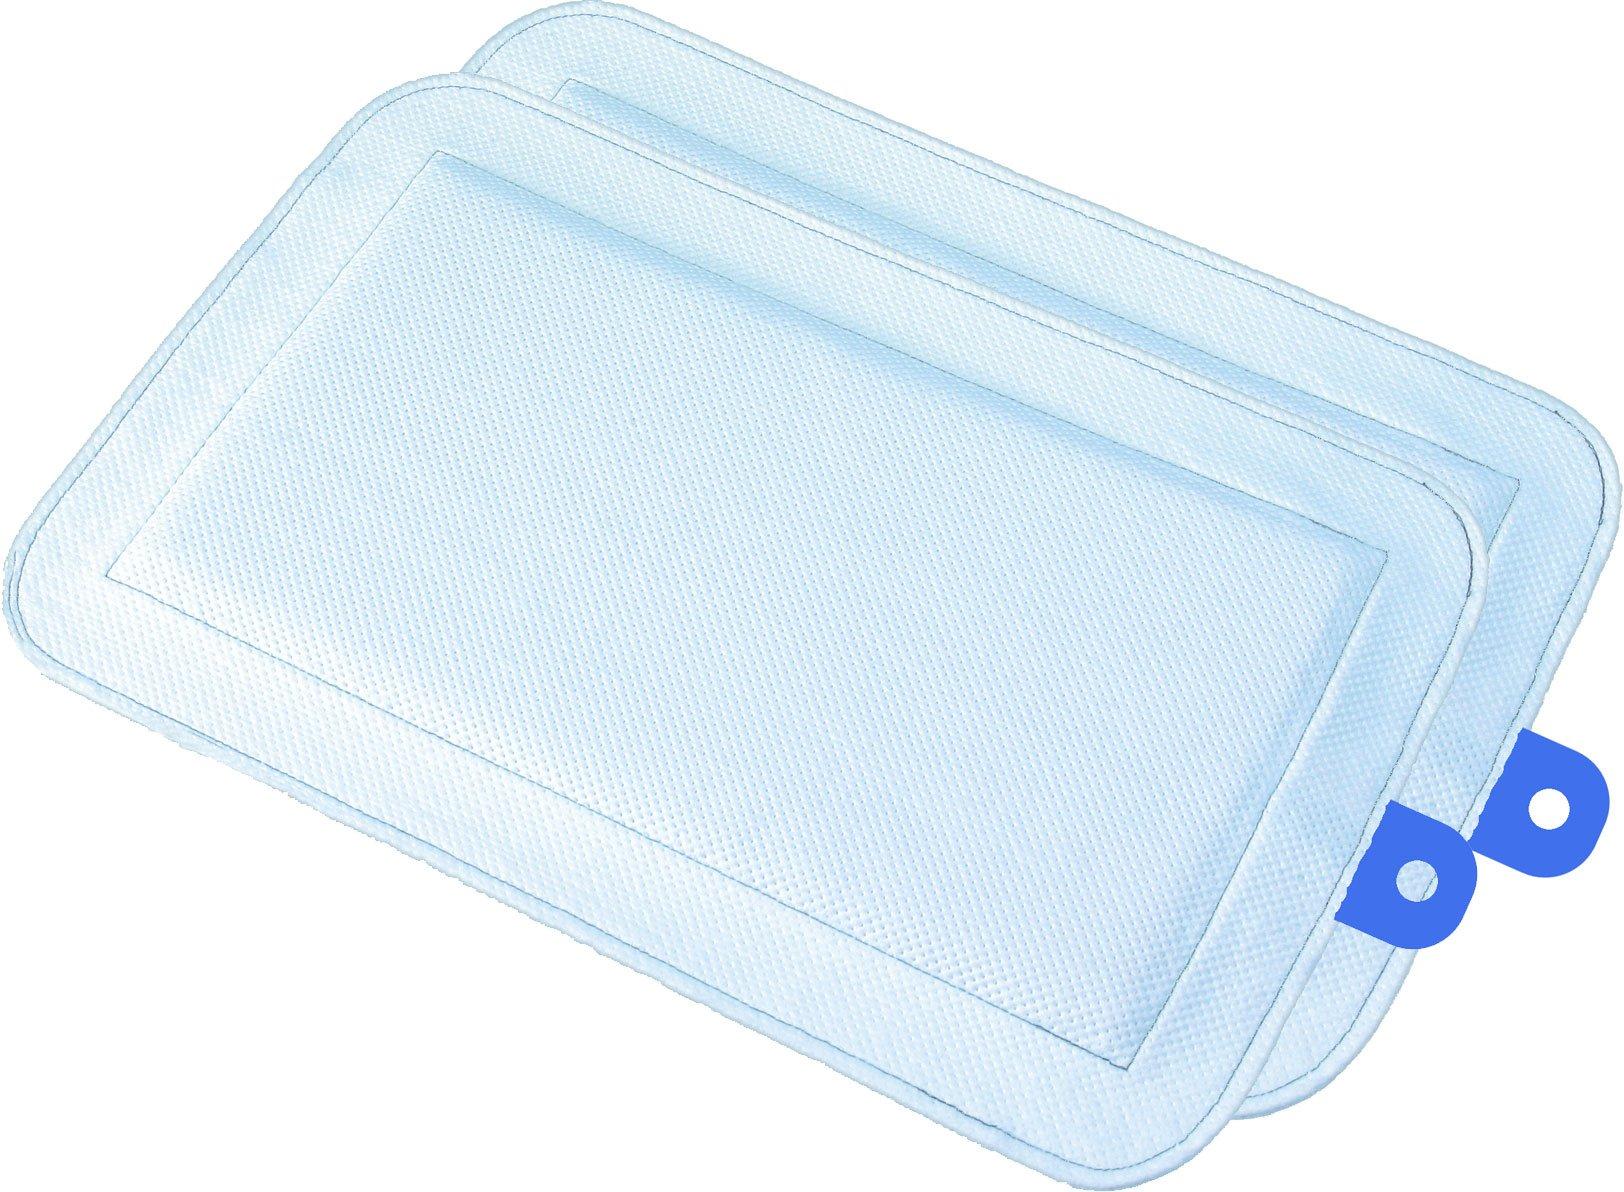 DryFur Pet Carrier Insert Pads size Small 19.5'' x 12.5'' Blue - 2 pack